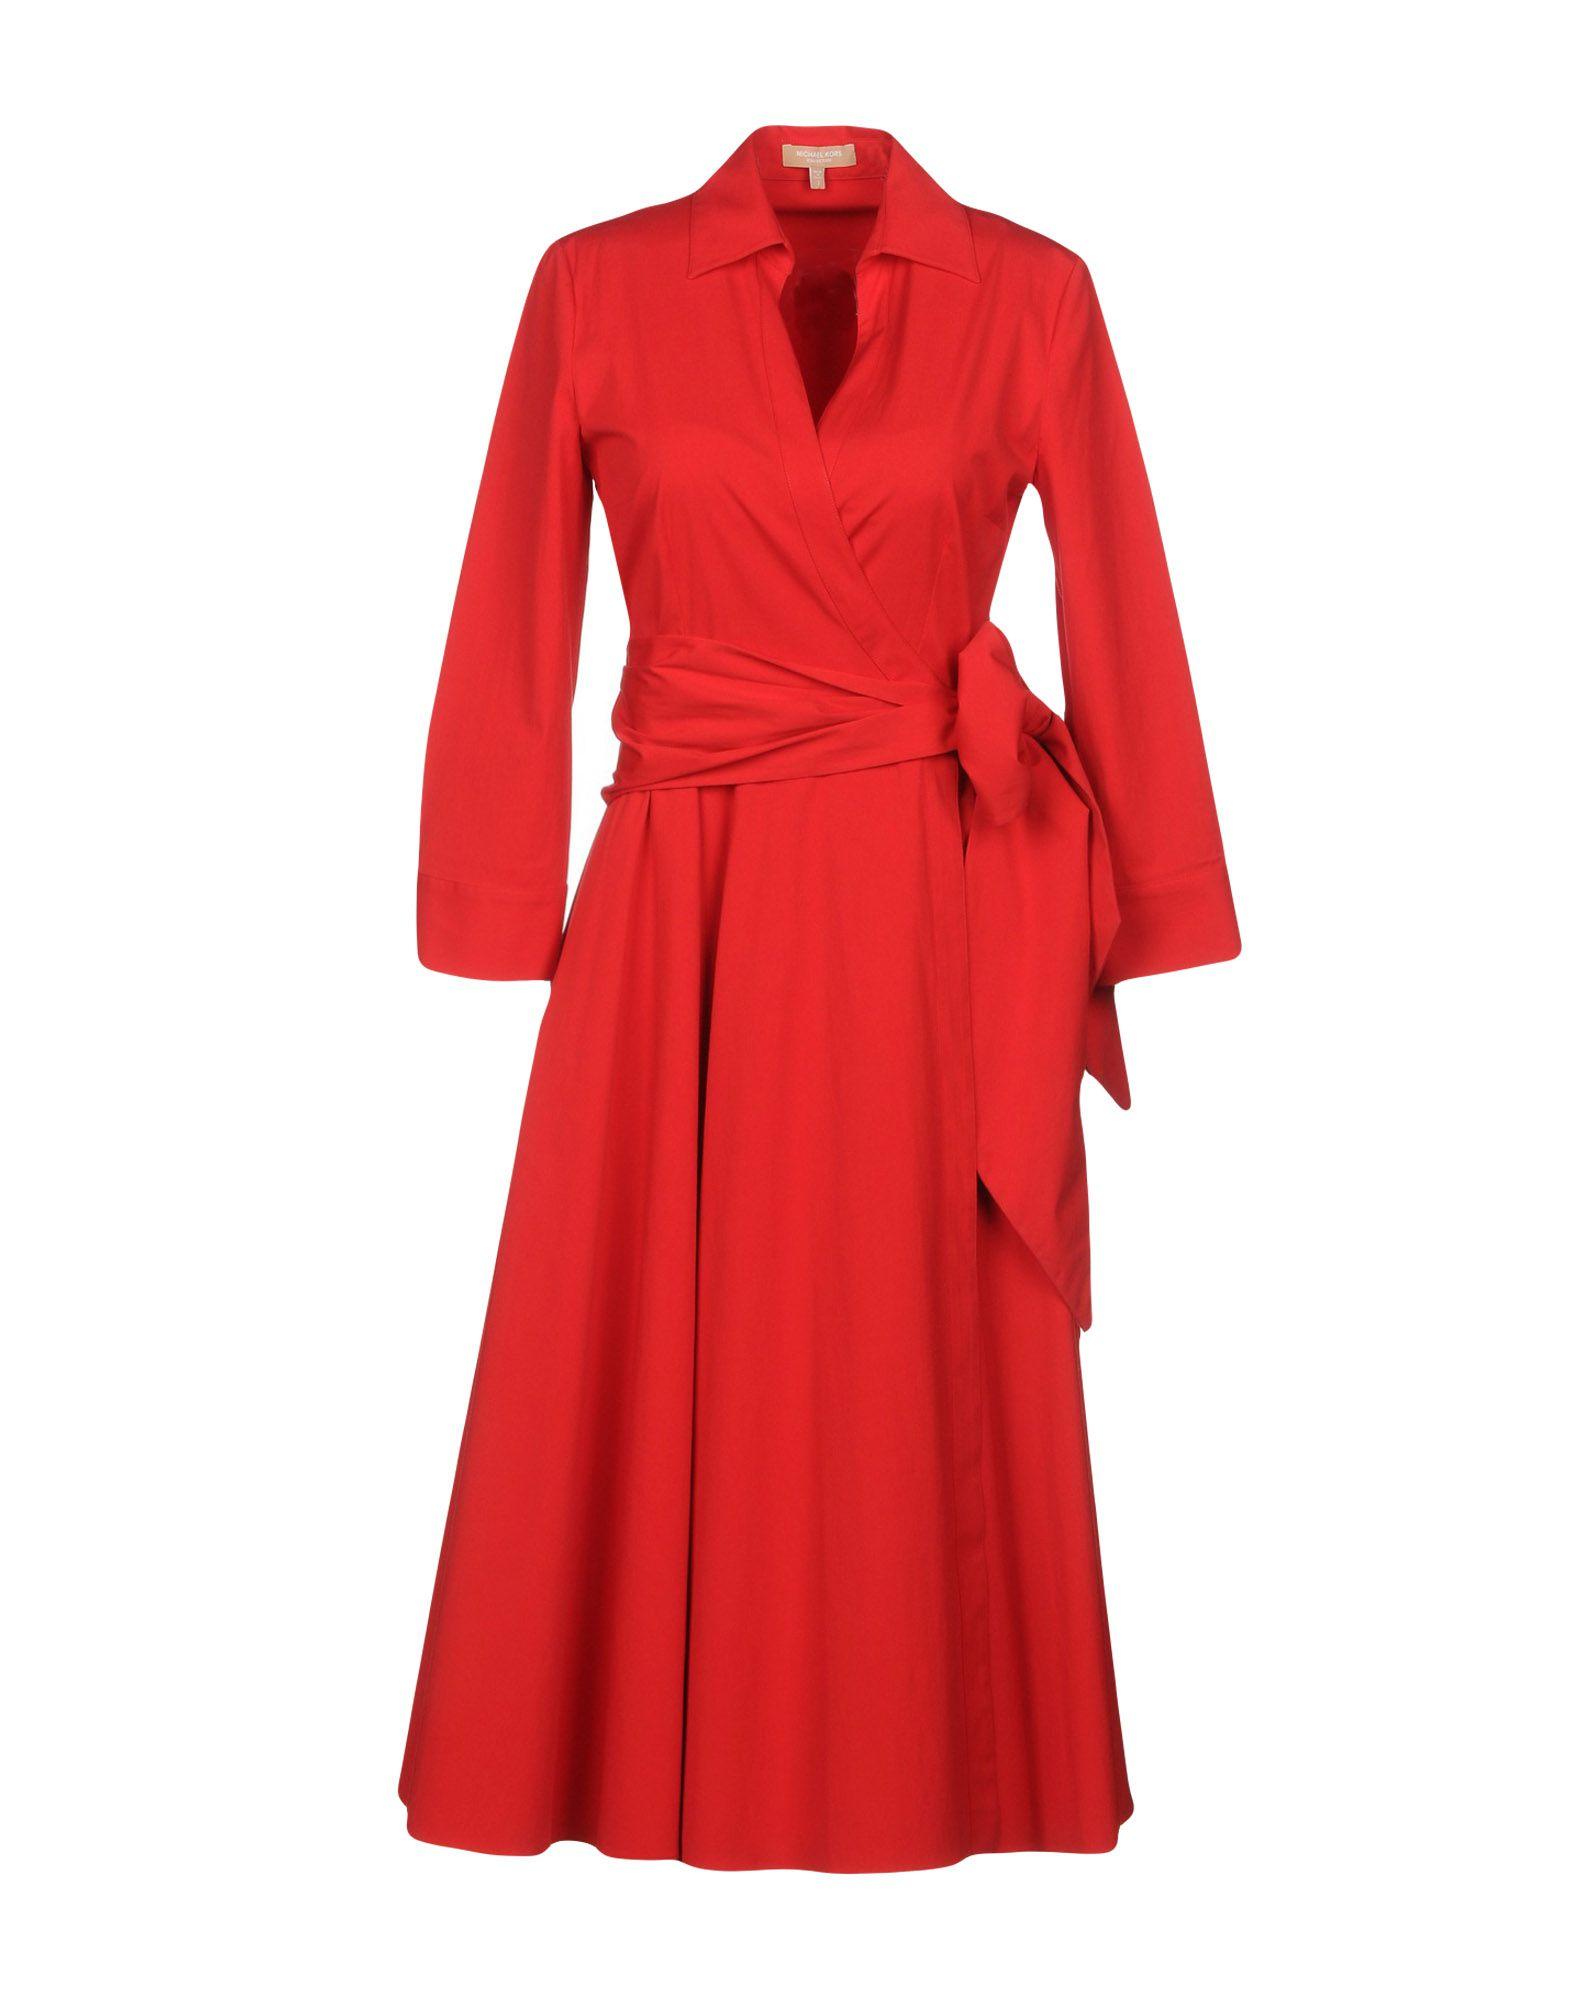 MICHAEL KORS COLLECTION Платье длиной 3/4 lisa corti платье длиной 3 4